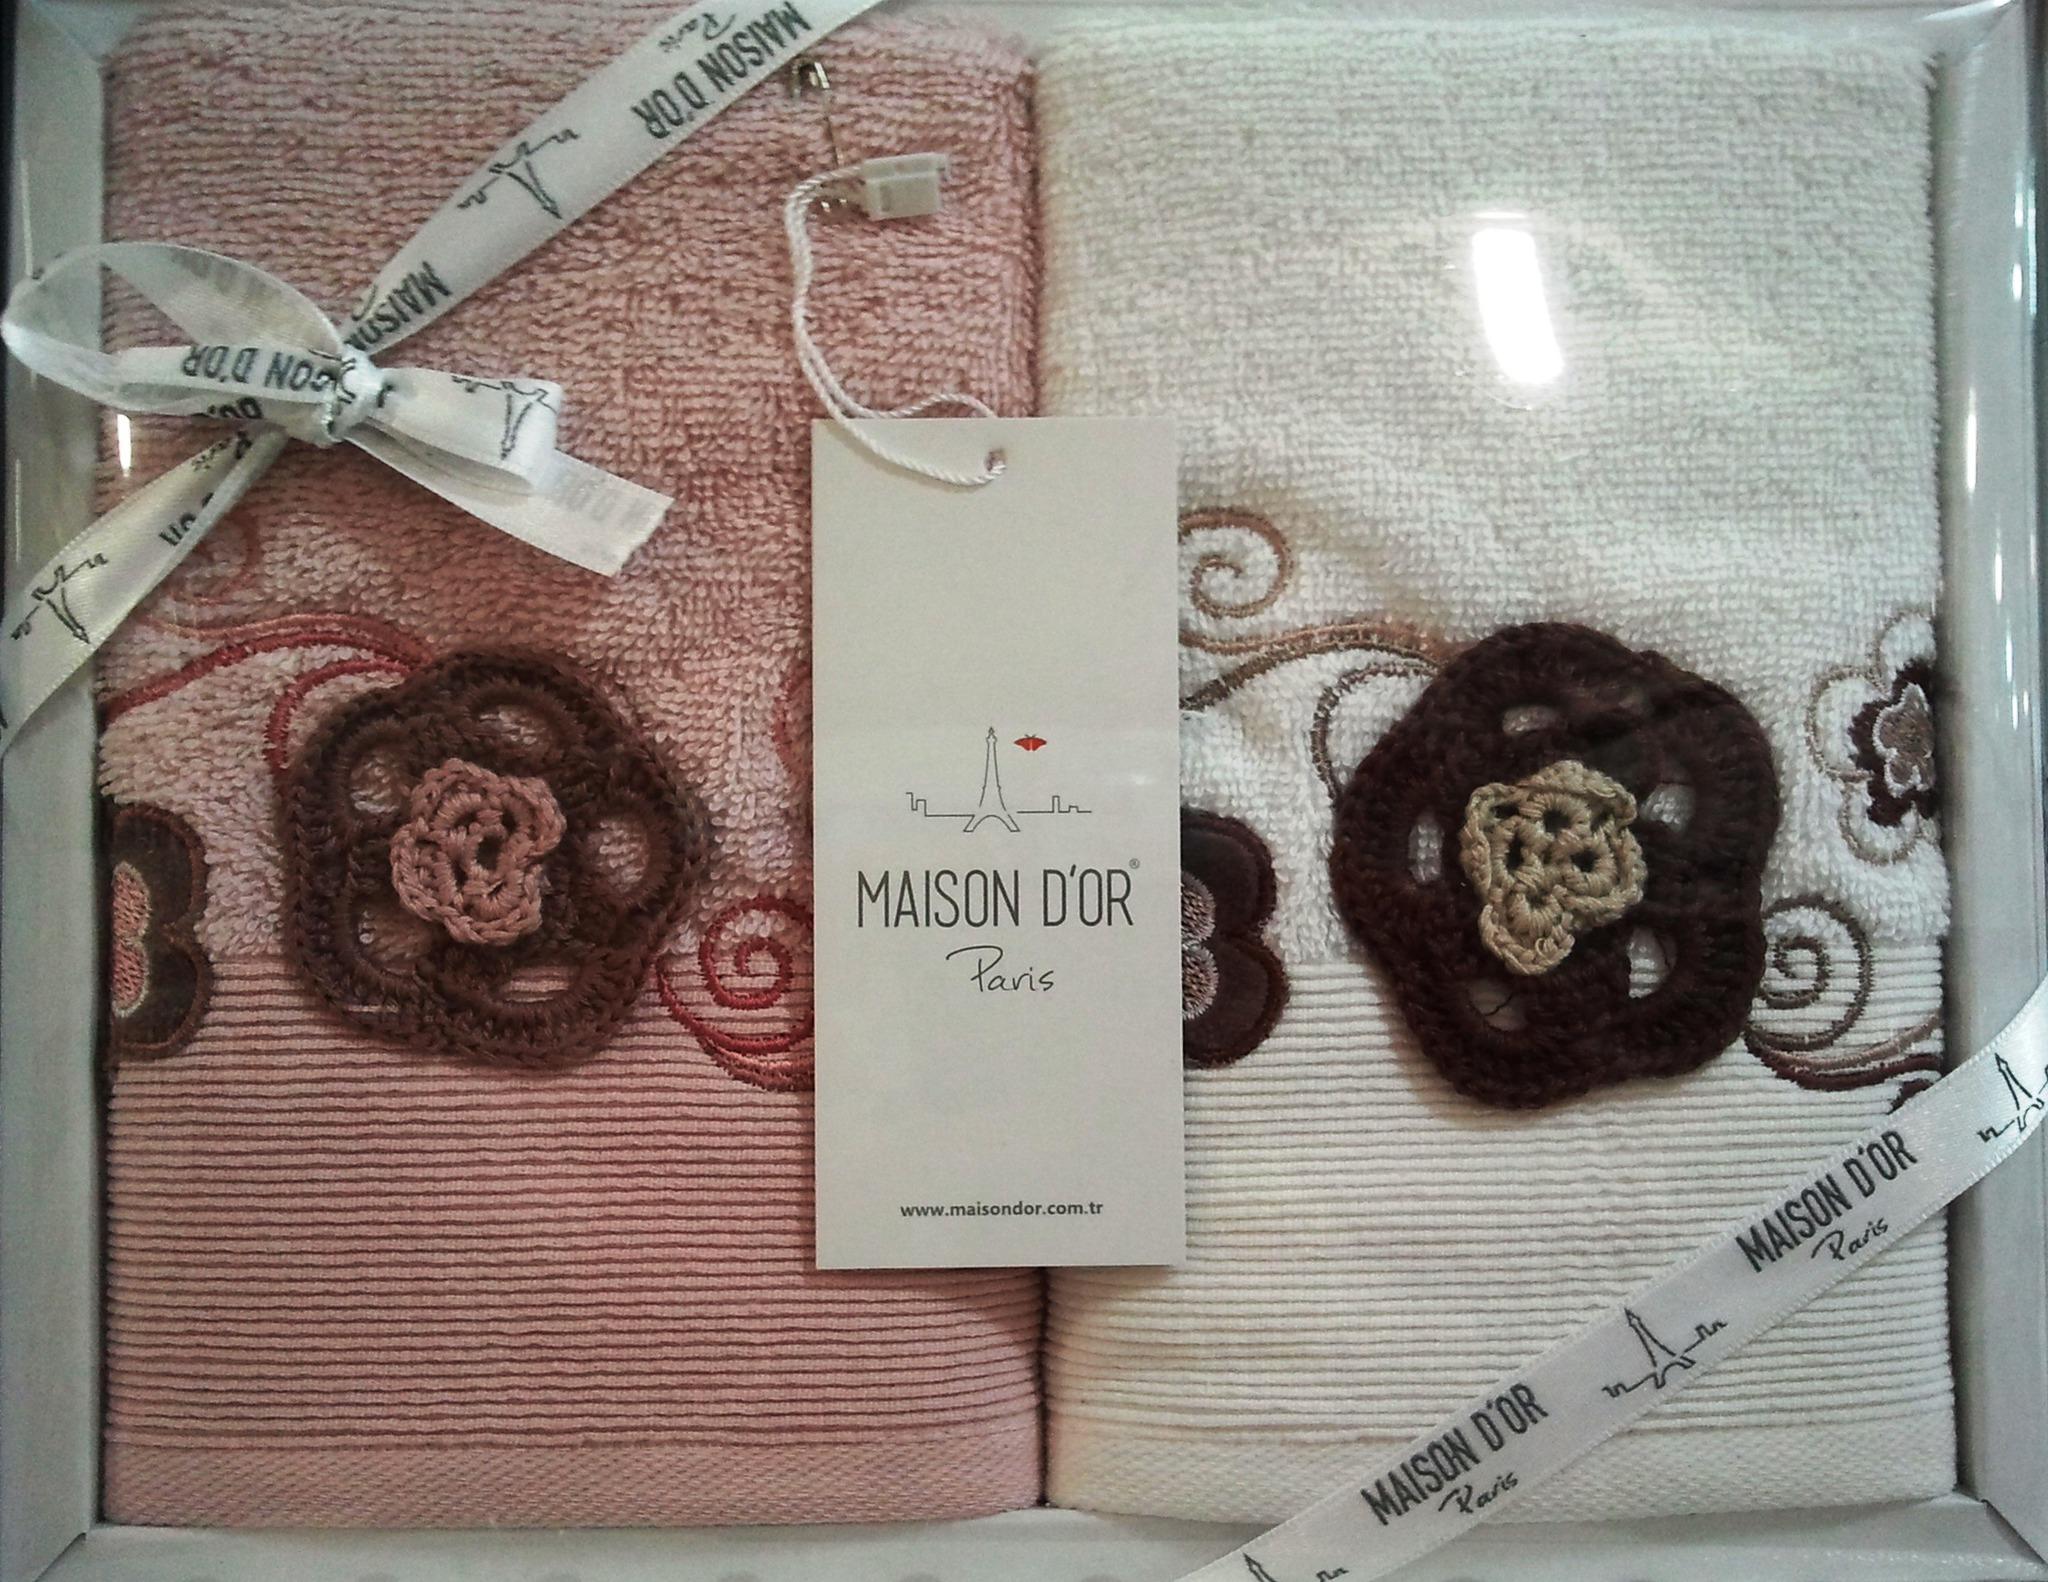 Полотенца Набор салфеток  CRAFT - КРАФТ в размере 40х60 Maison Dor (Турция) КРАФТ_2ШТ._40х60__2_.jpg